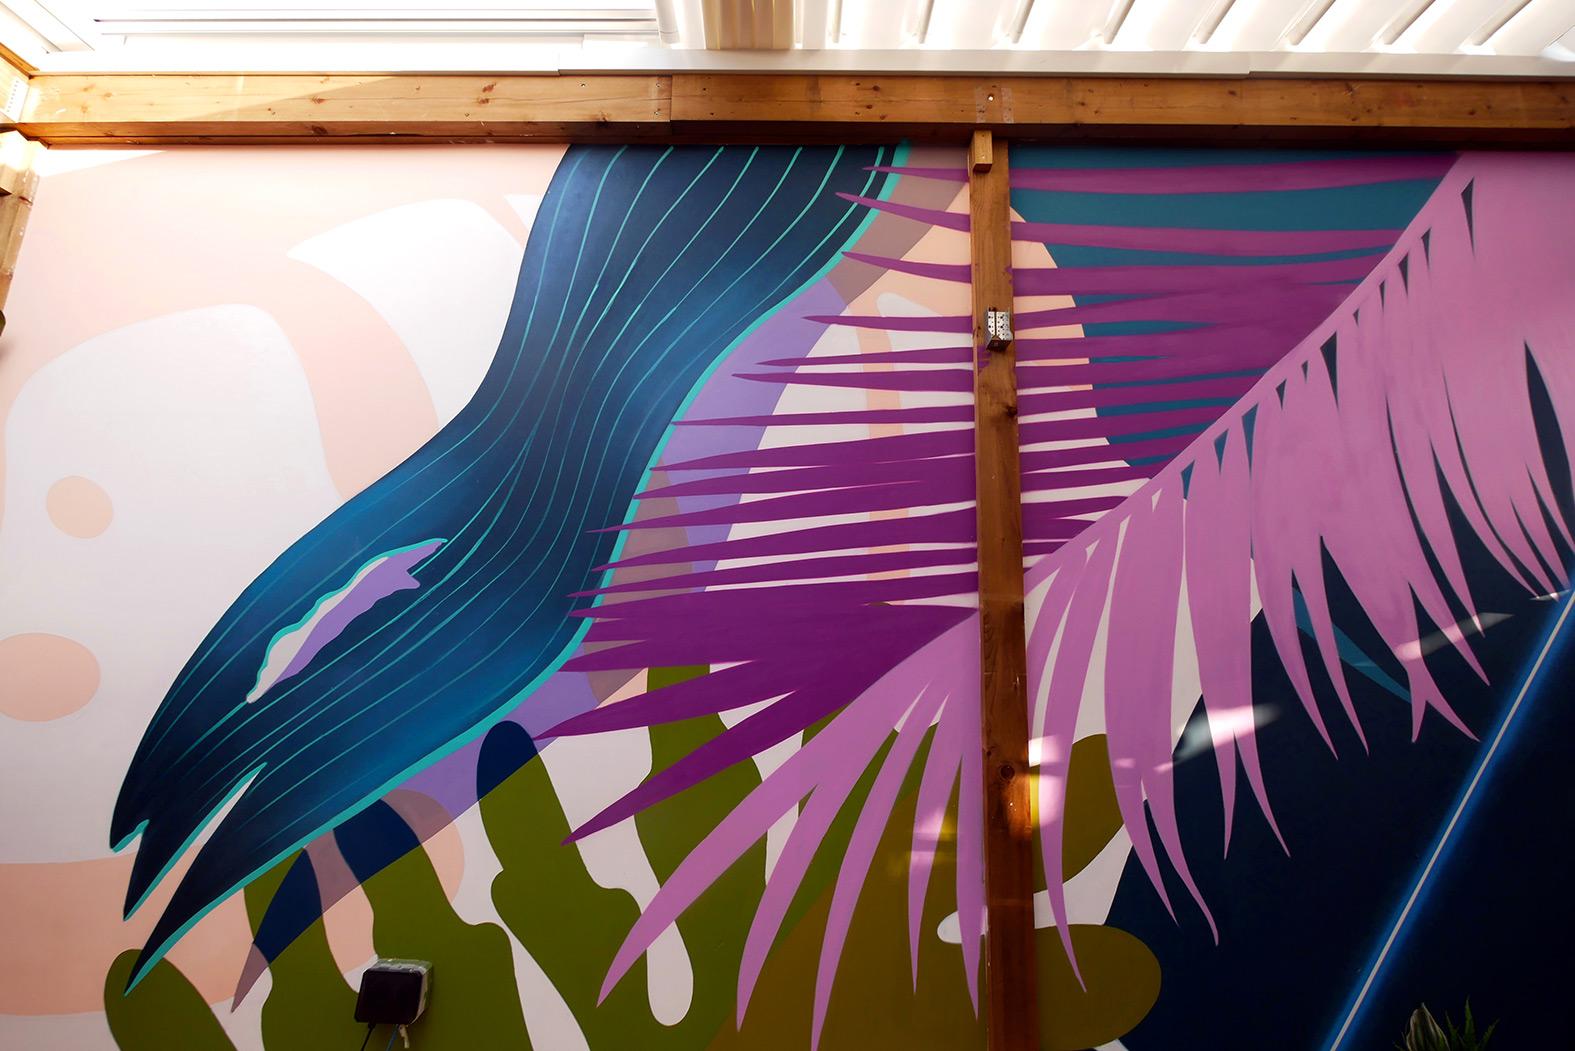 Nerone-lost-in-brixton-mural-painting-street-art-15